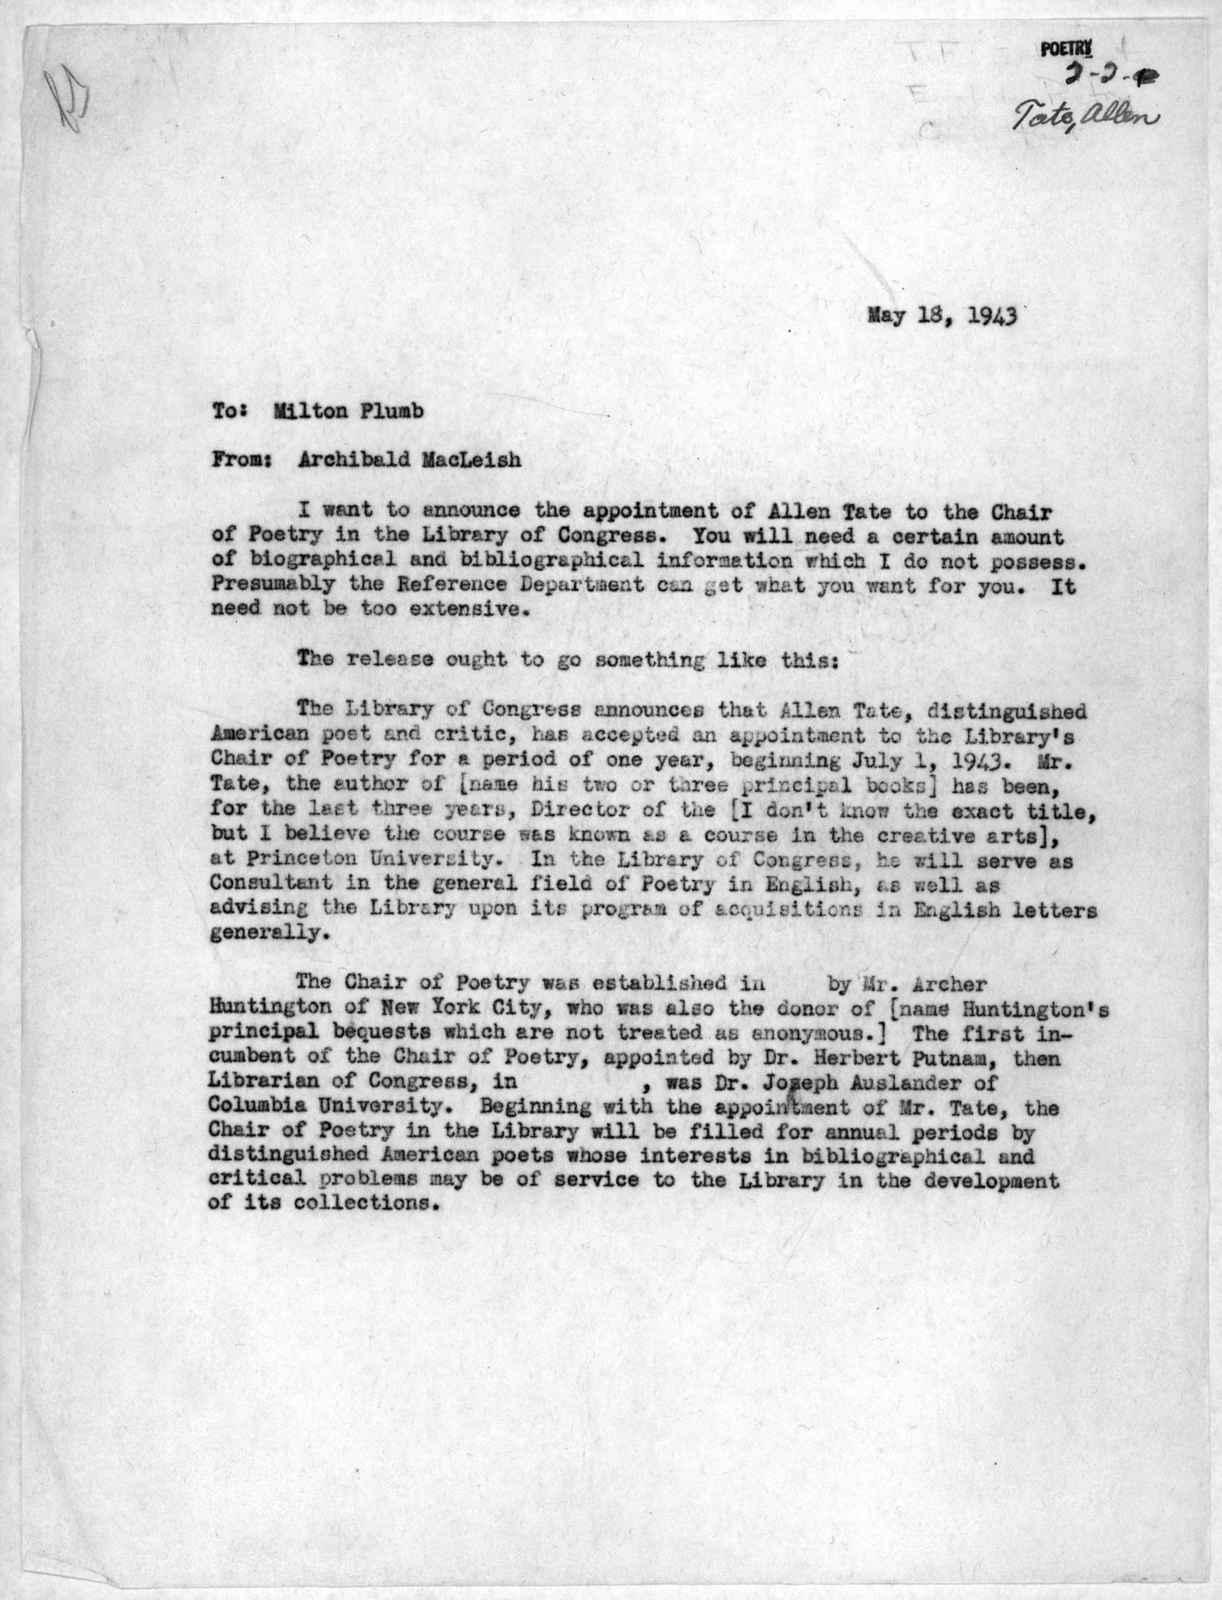 Memorandum from Archibald MacLeish to Milton Plumb, May 18, 1943